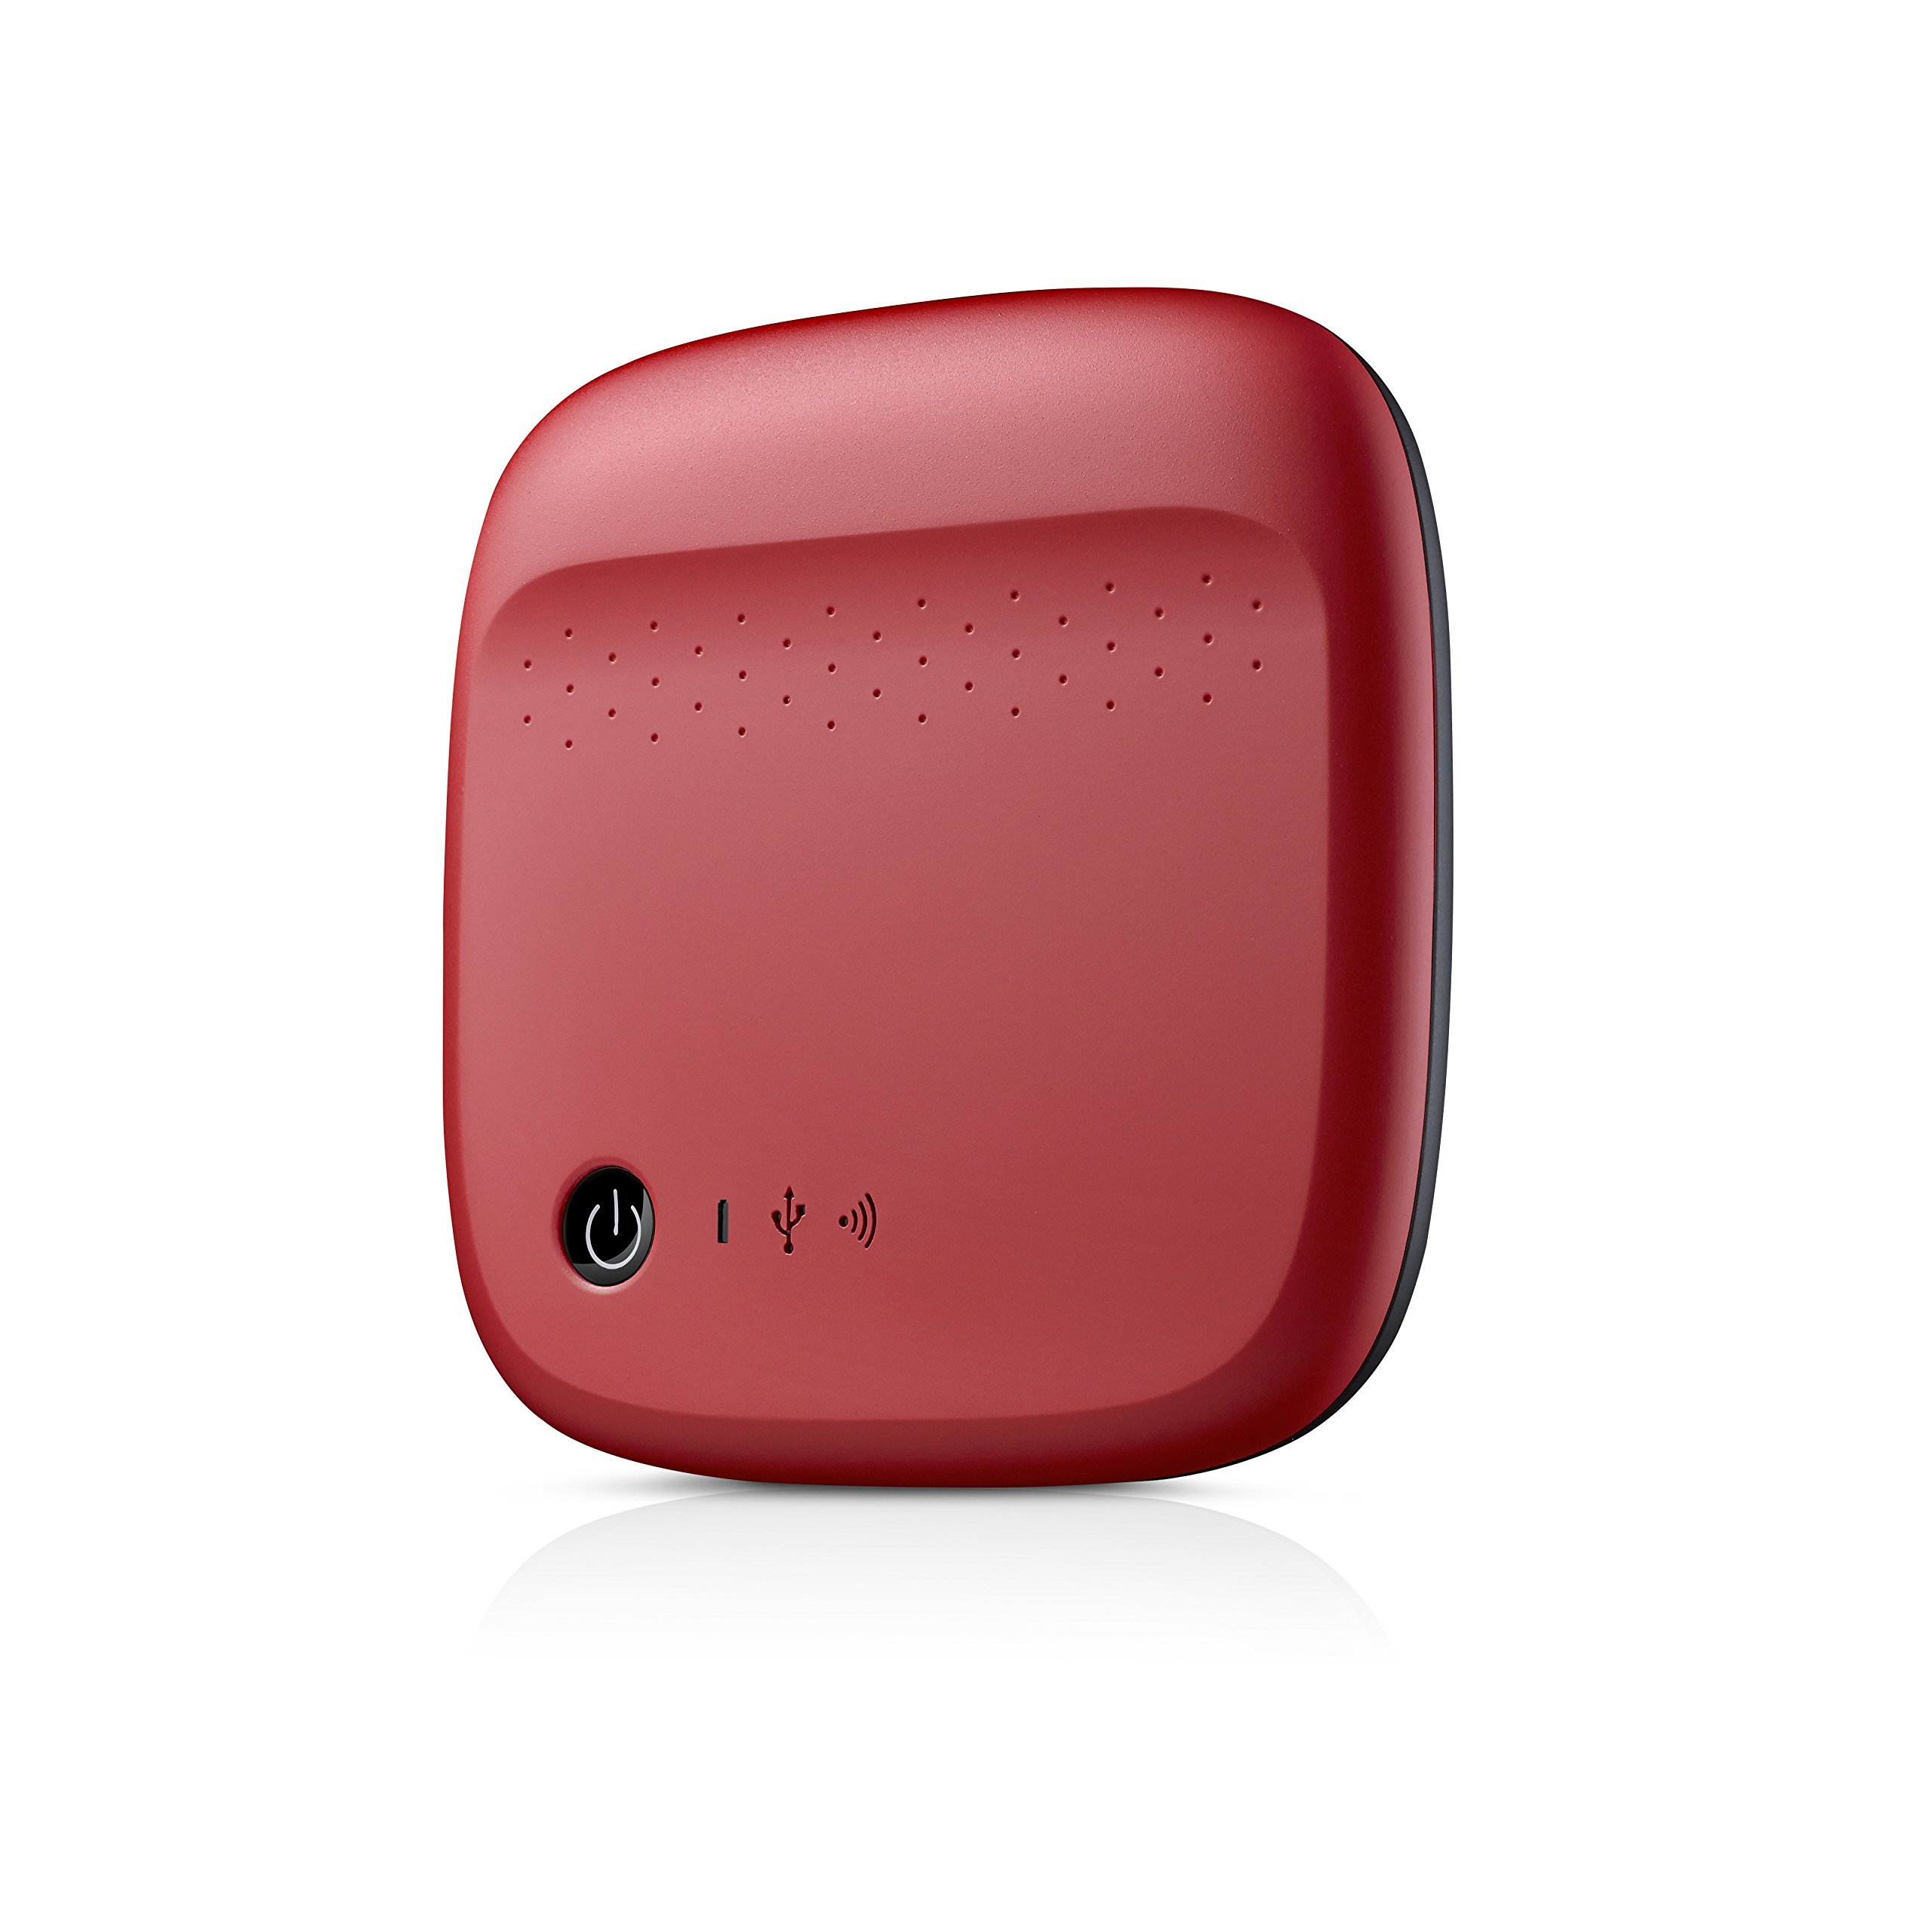 Seagate Wireless Mobile Portable Hard Drive Storage 500GB STDC500402 (Red)